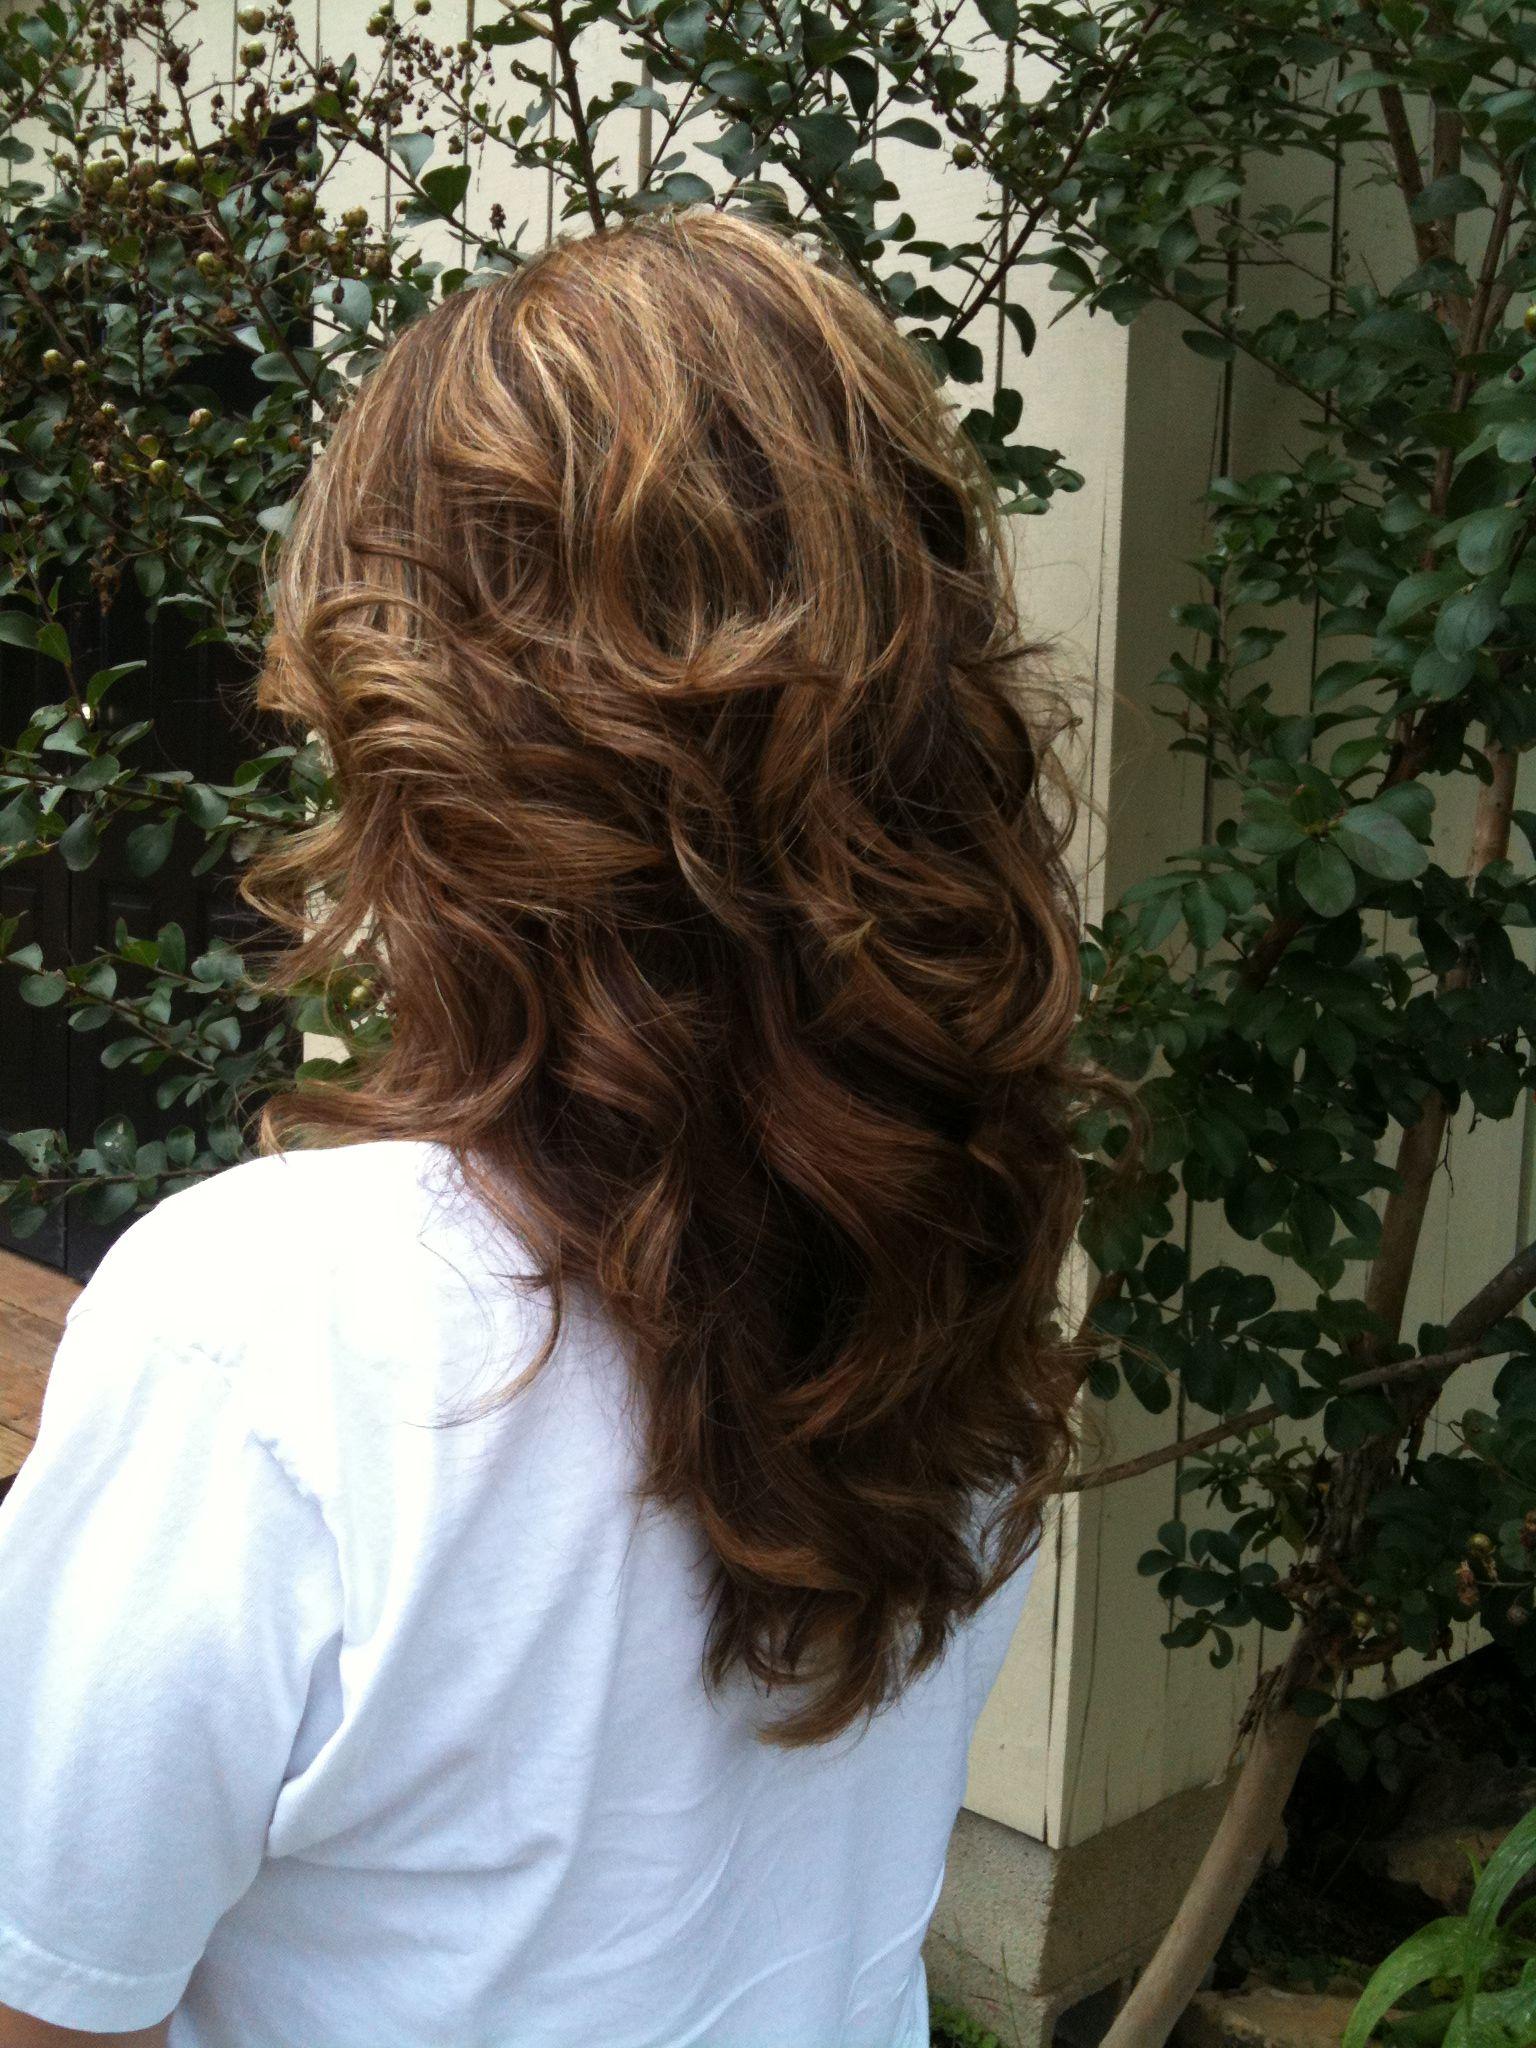 Long loose curls hair styles makeup etc pinterest long loose